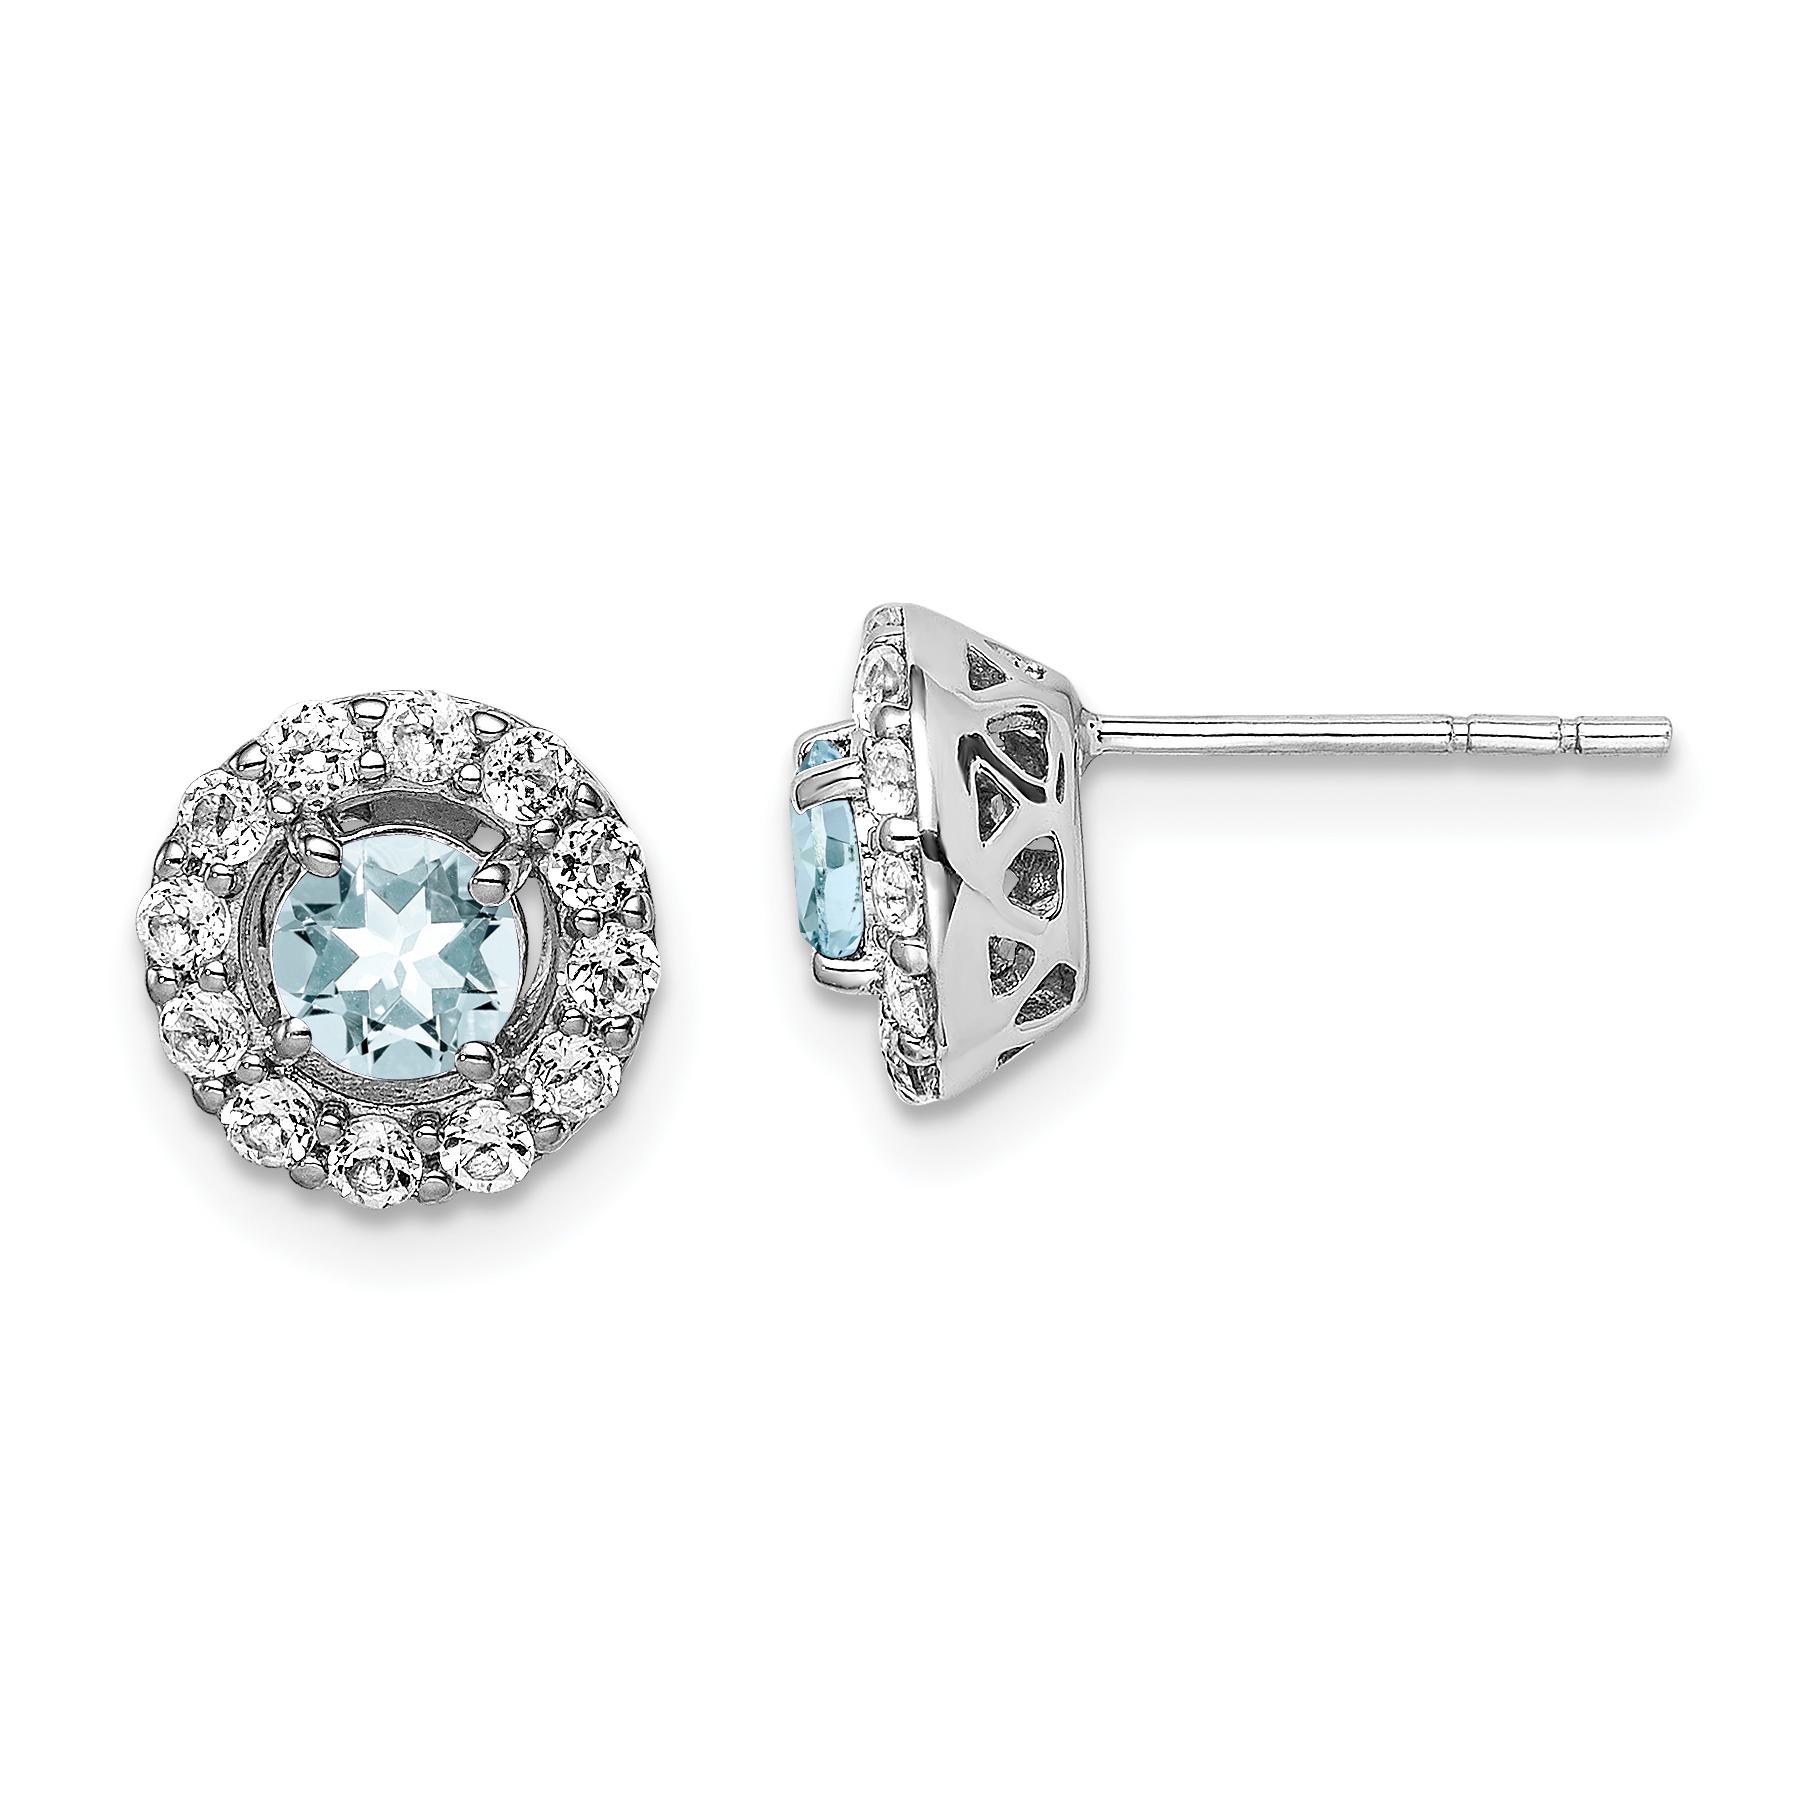 Sterling Silver Rhodium Plated White Topaz Aquamarine Earrings 0 85ct